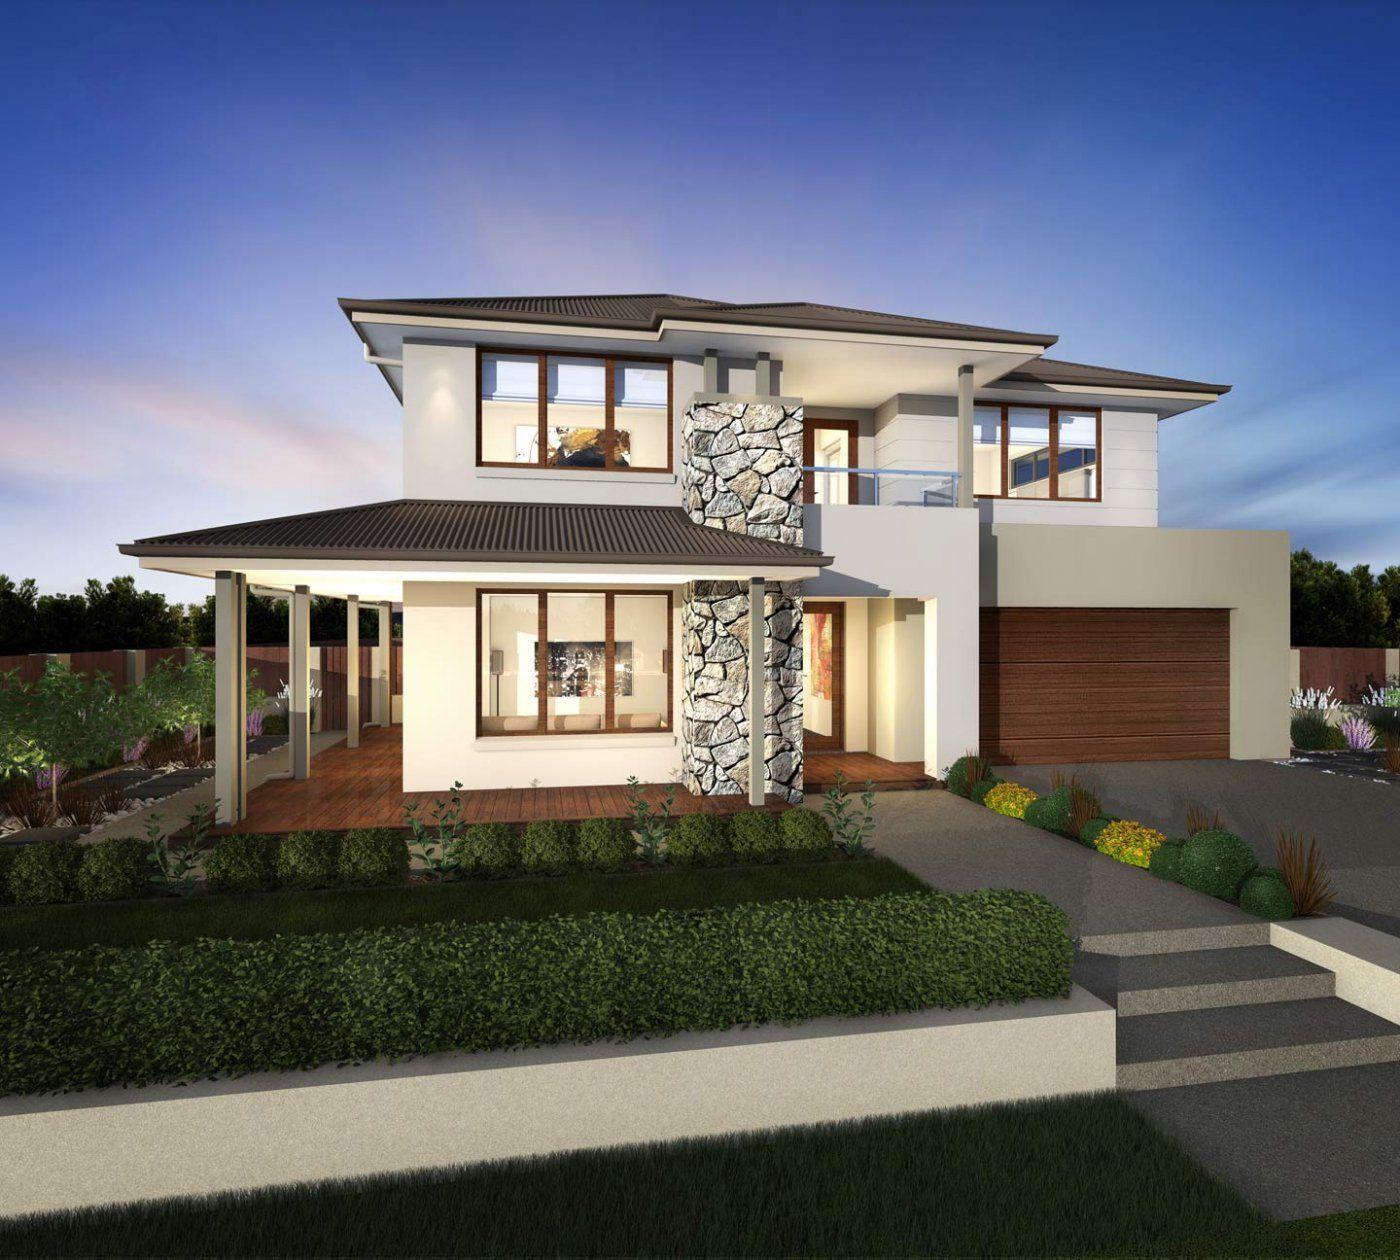 Huntingdale facades mcdonald jones homes like the for Mcdonalds exterior design